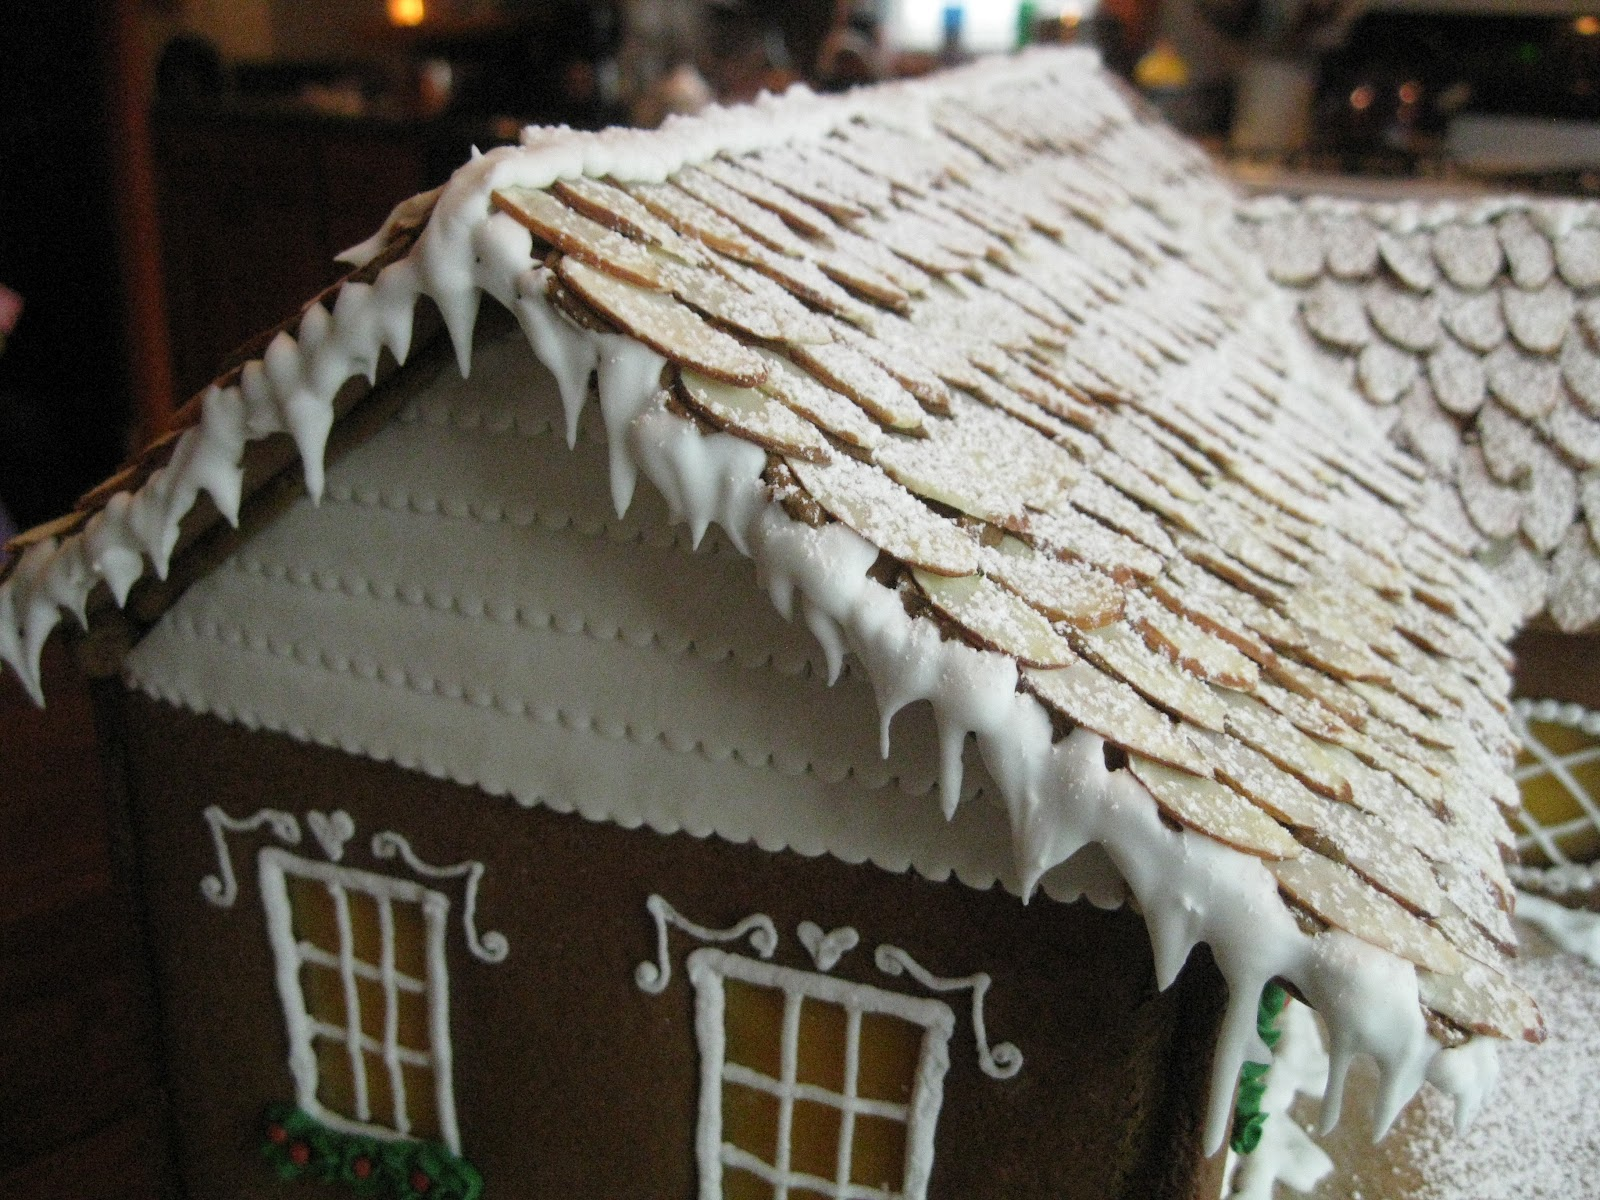 Premade Gingerbread Houses Tis The Season For Building Gingerbread Houses Blogs The